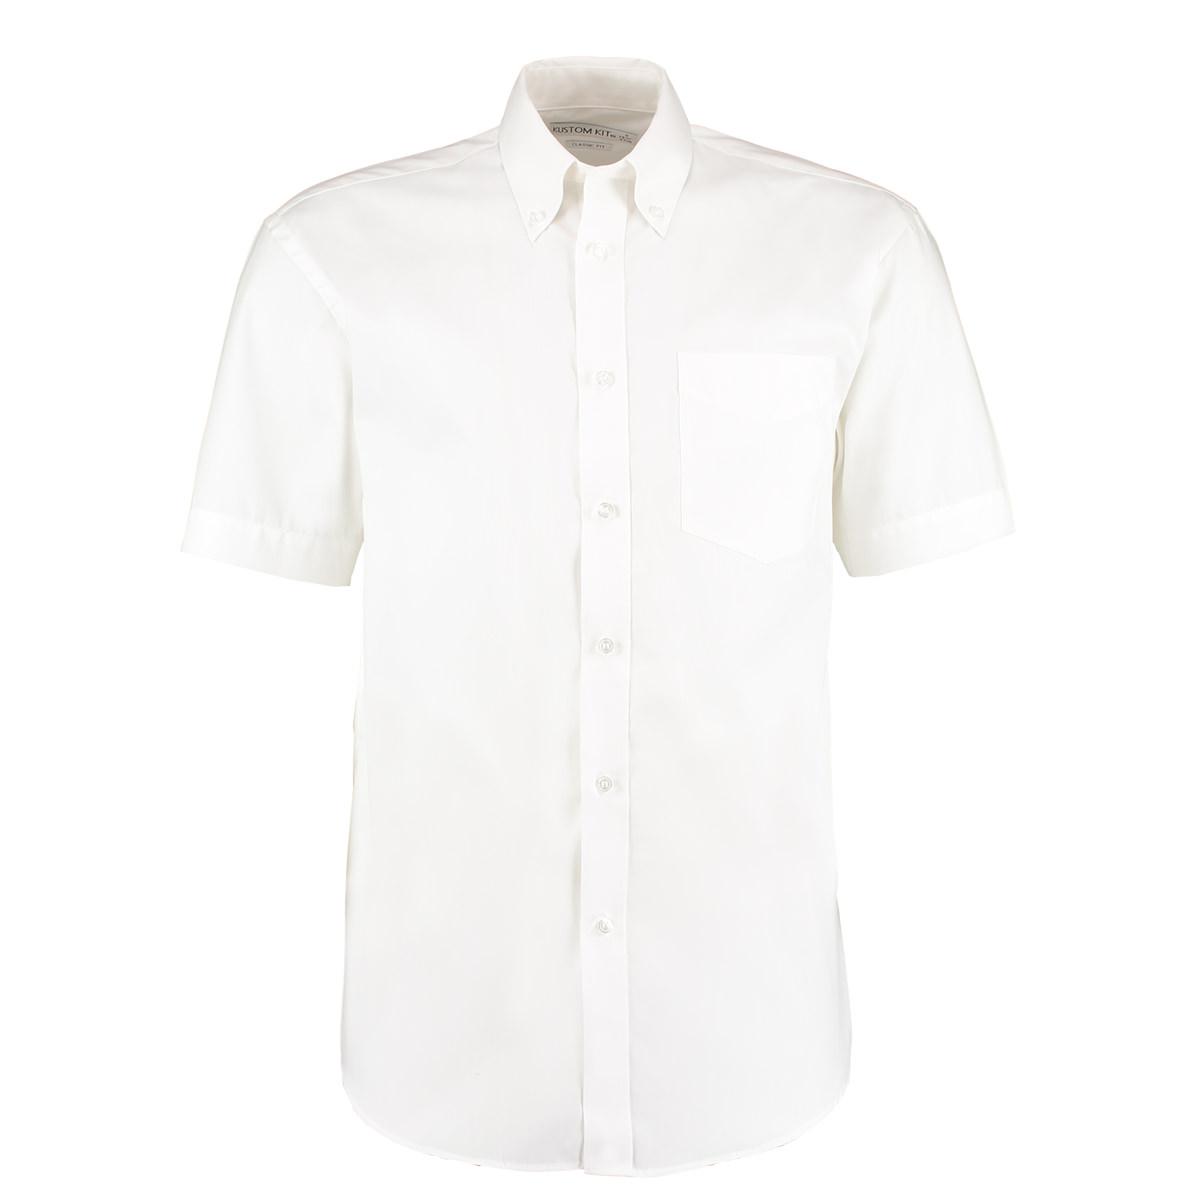 Mens Short Sleeve Oxford Shirt